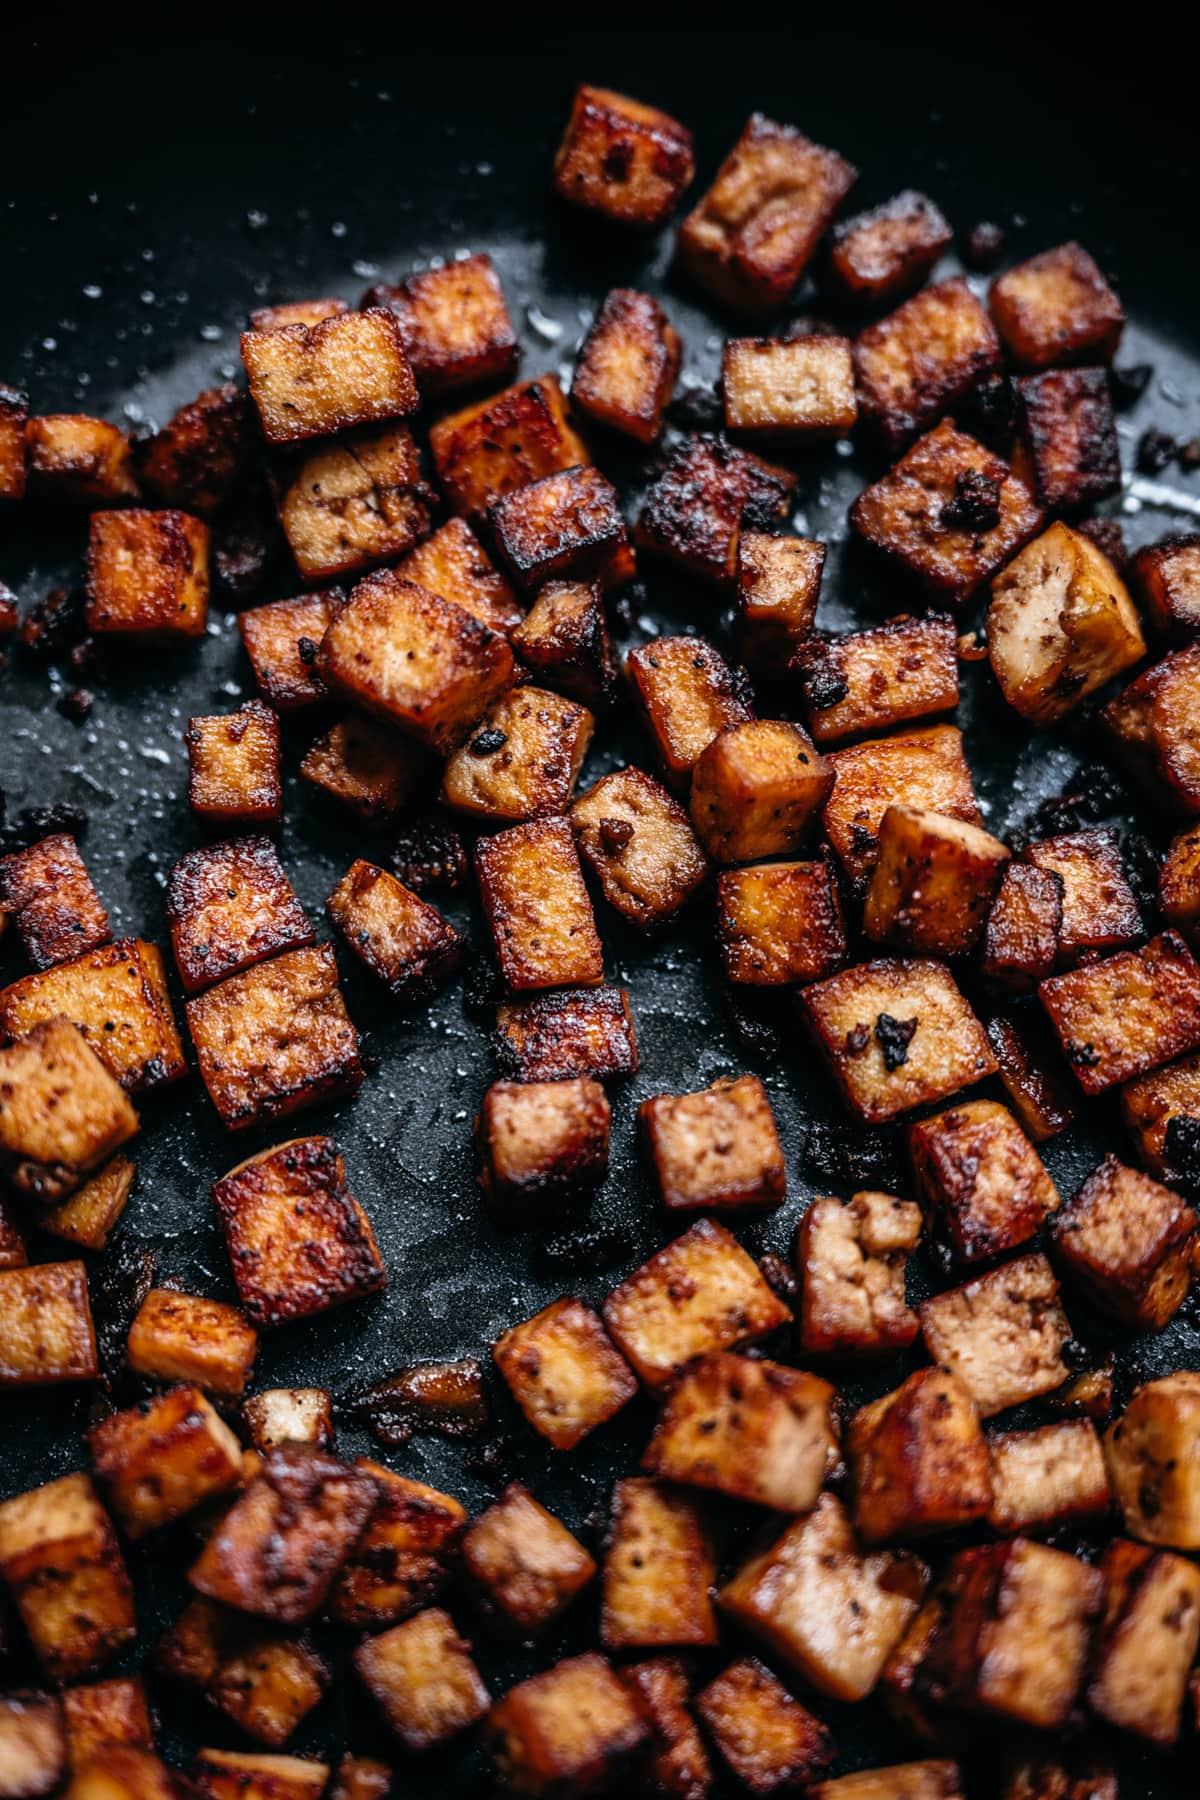 close up view of vegan tofu bacon bites in a pan.